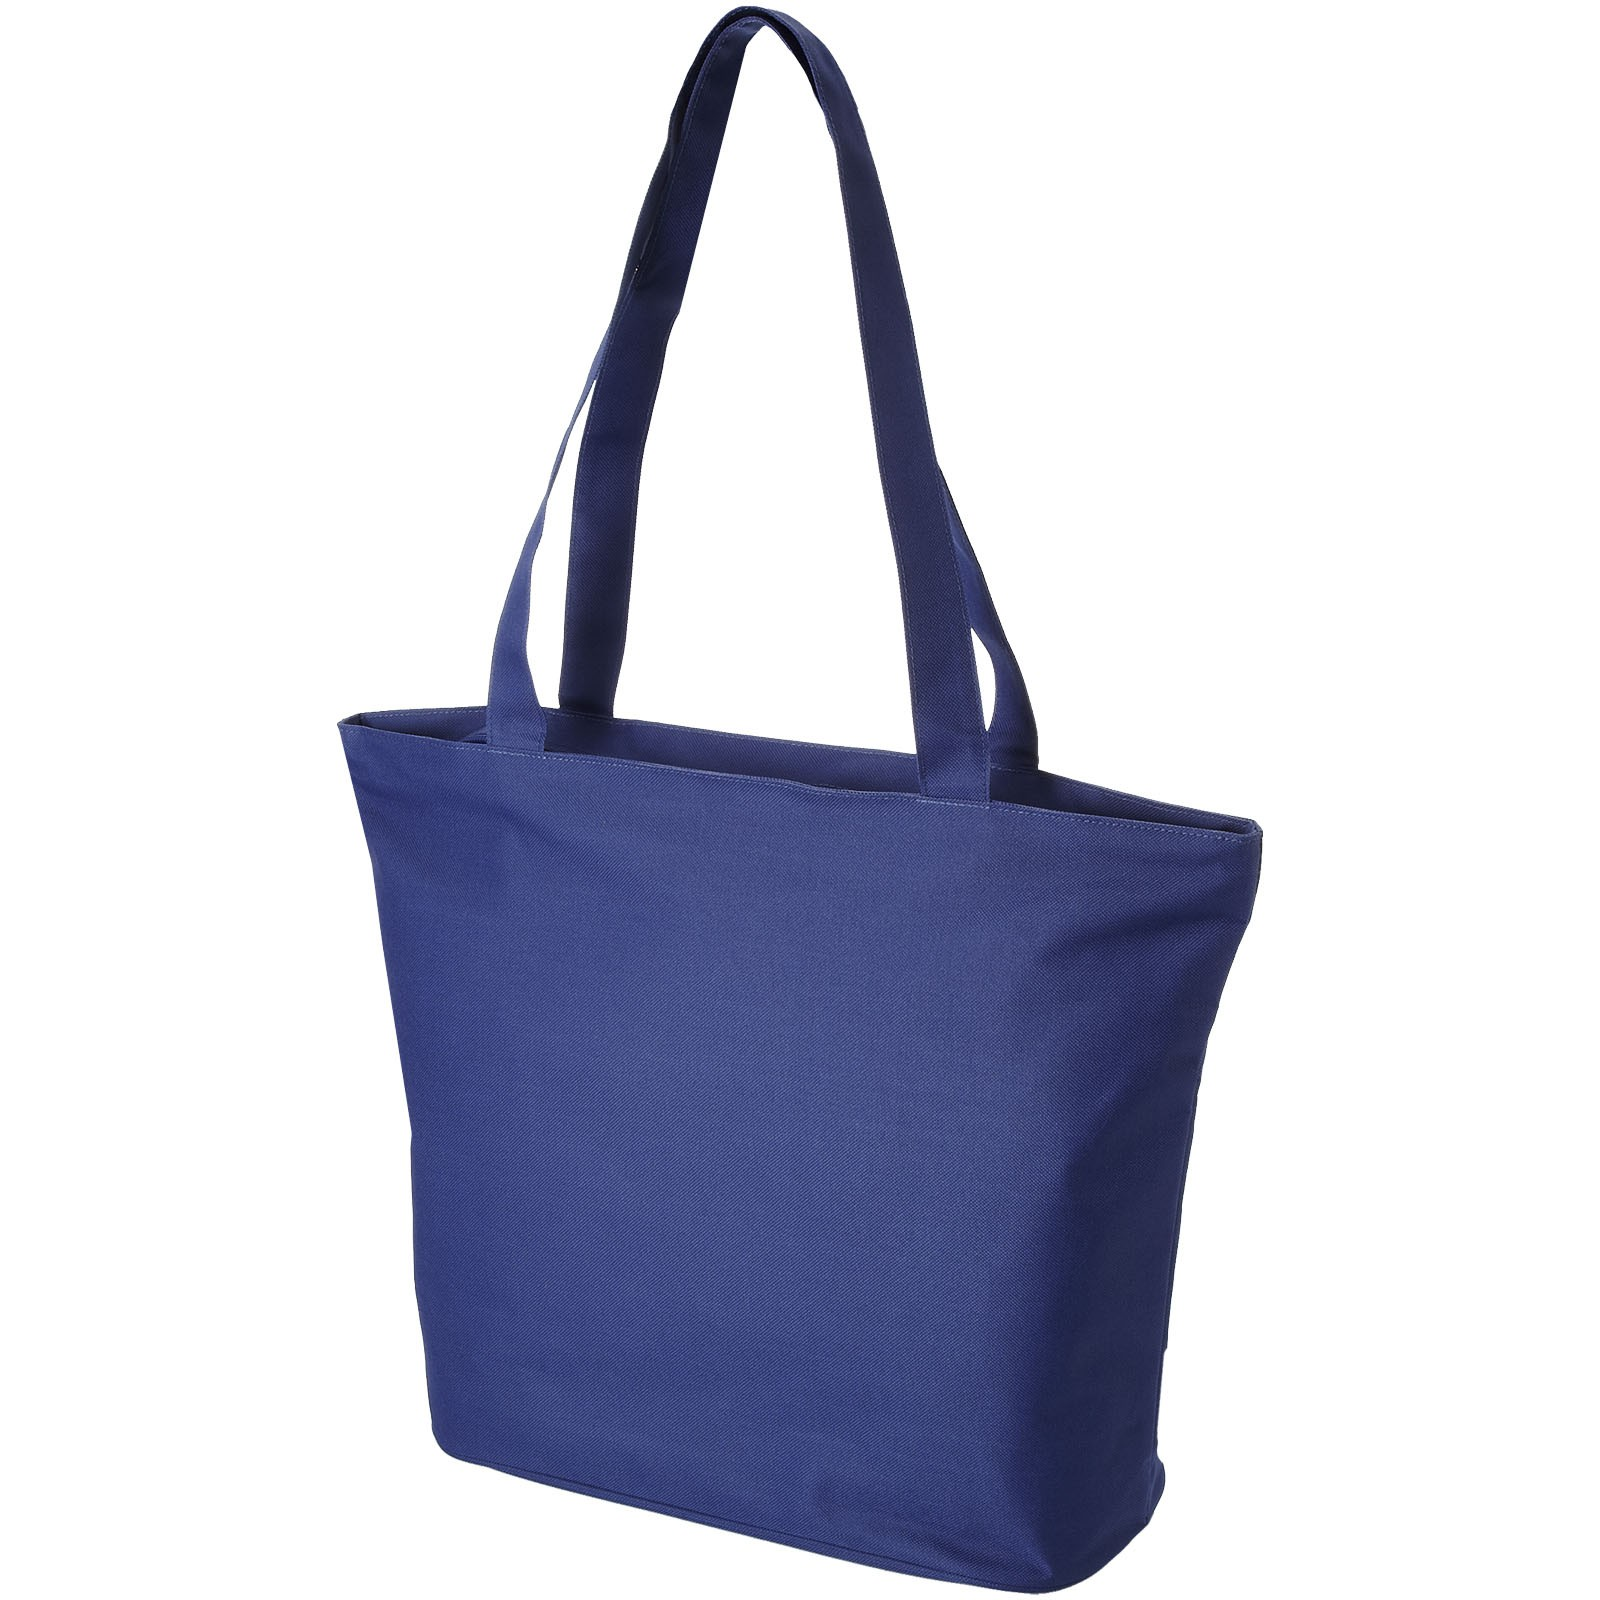 Panama zippered tote bag - Royal blue